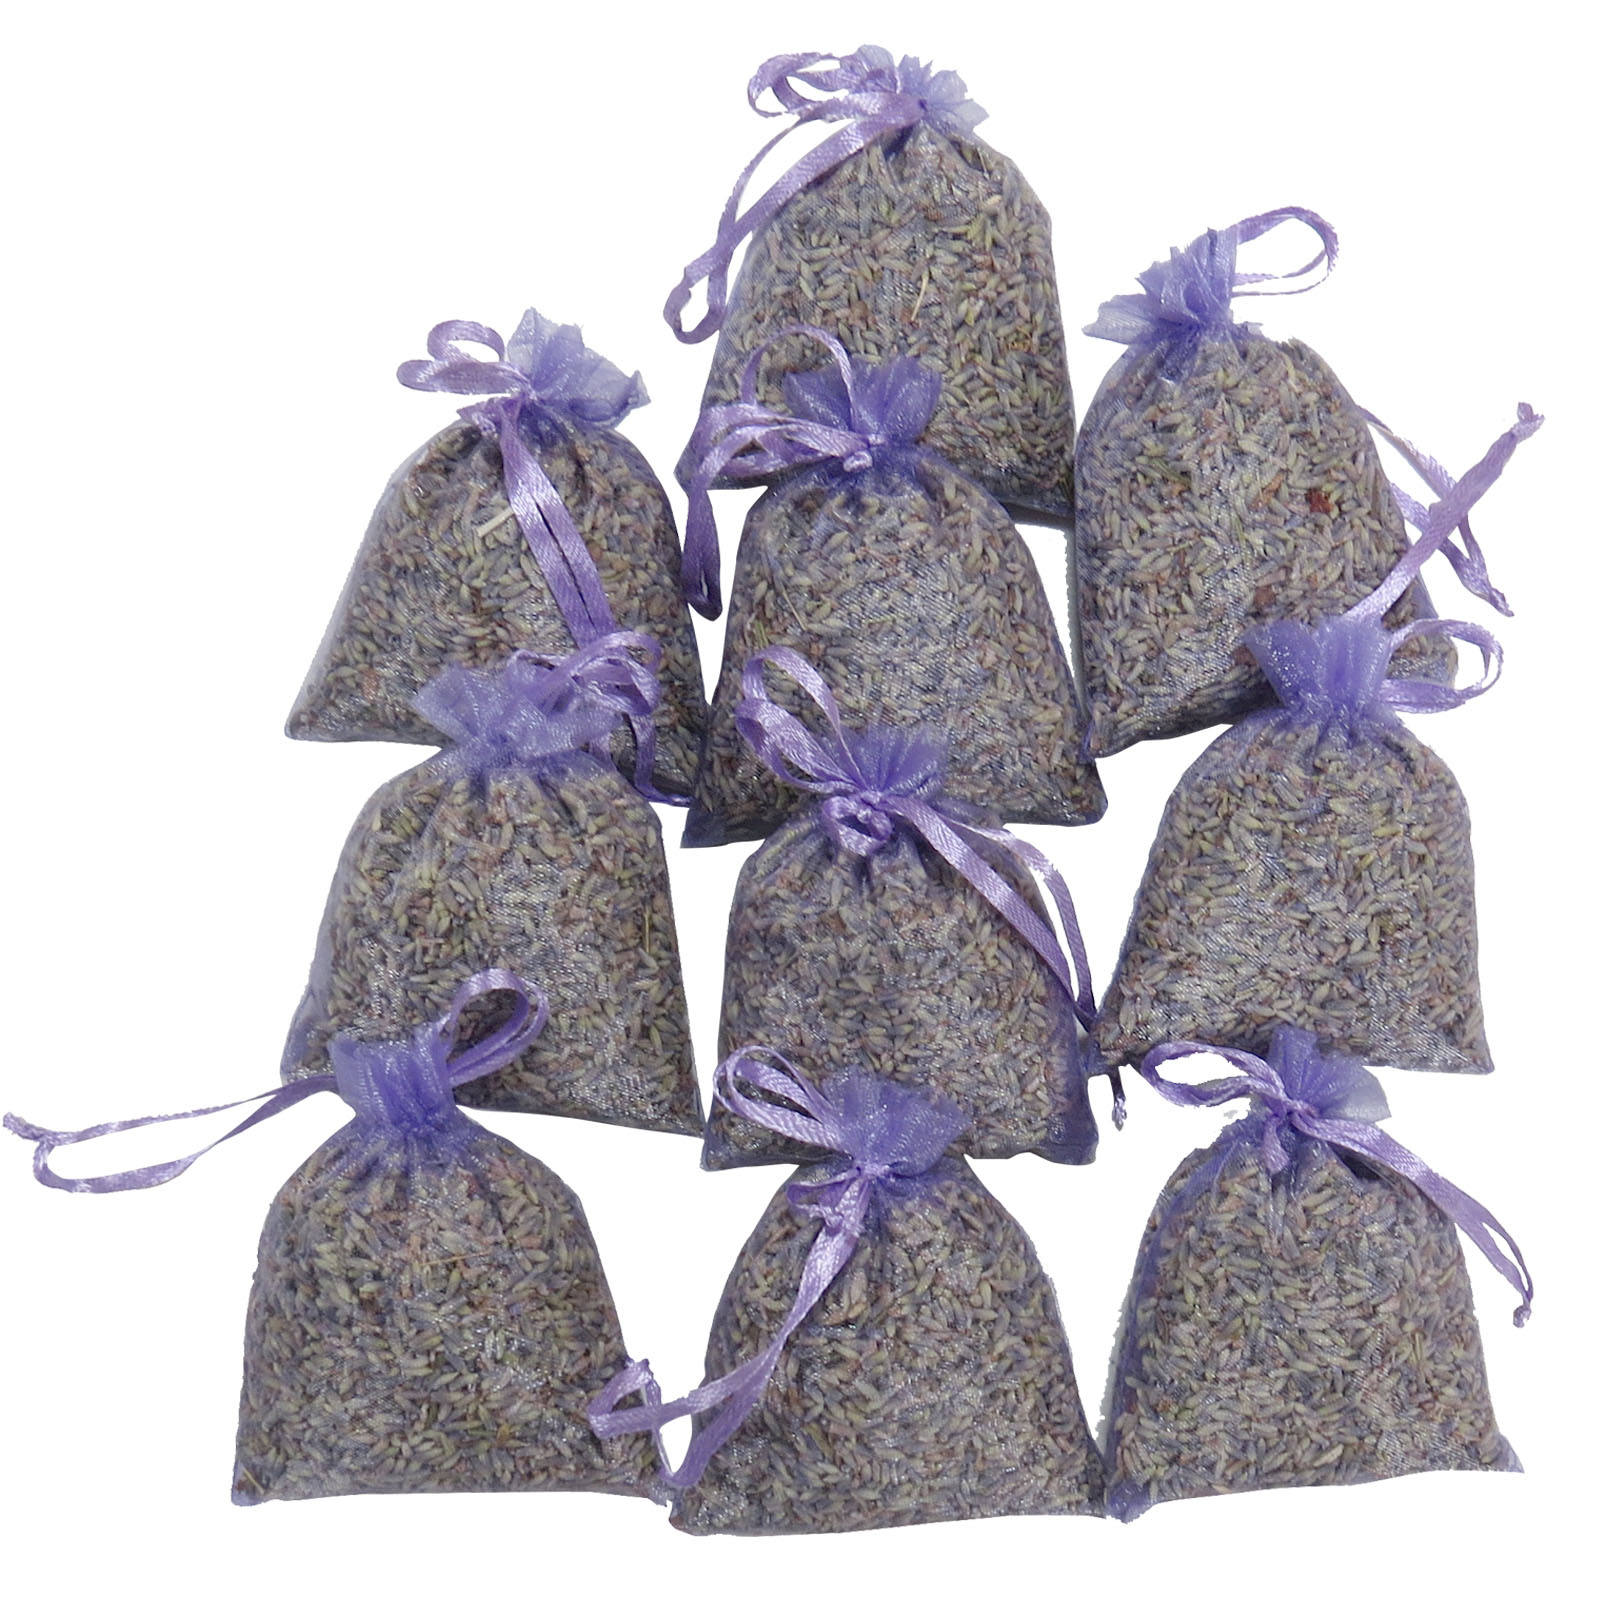 Organza Bags Wedding Favor 25pcs Lavender Sachets Set Etsy